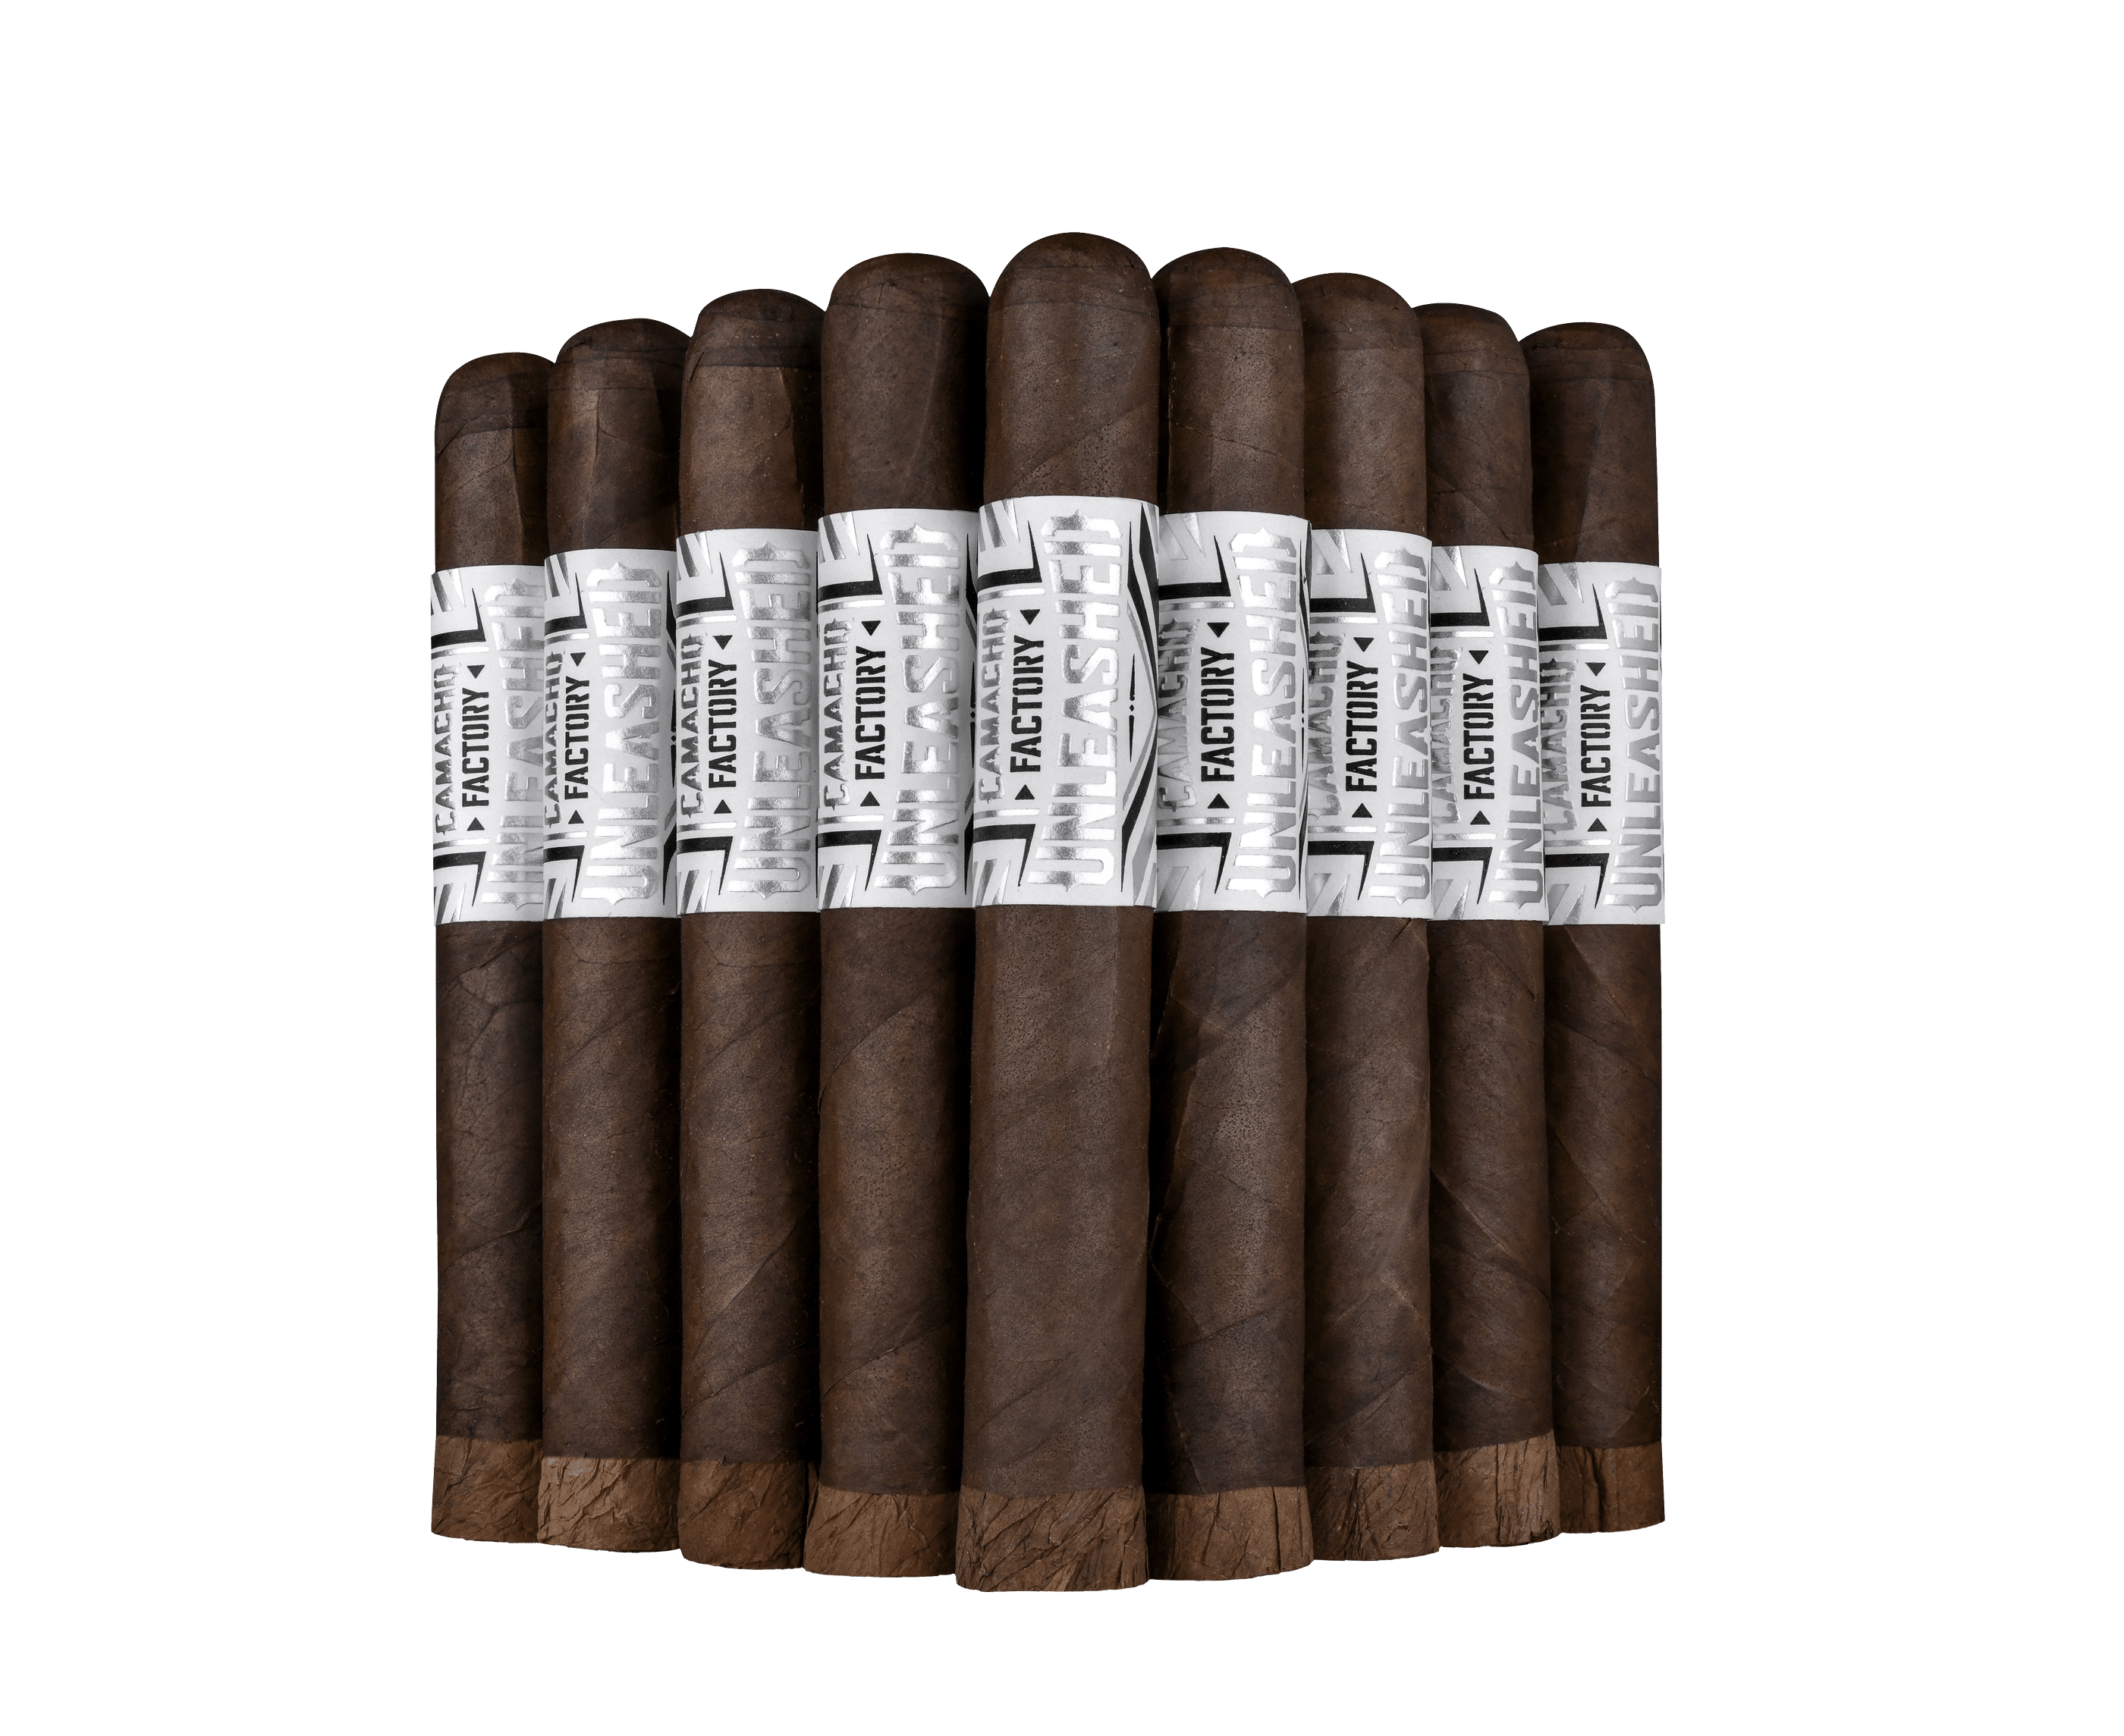 Camacho Announces Factory Unleashed - Cigar News